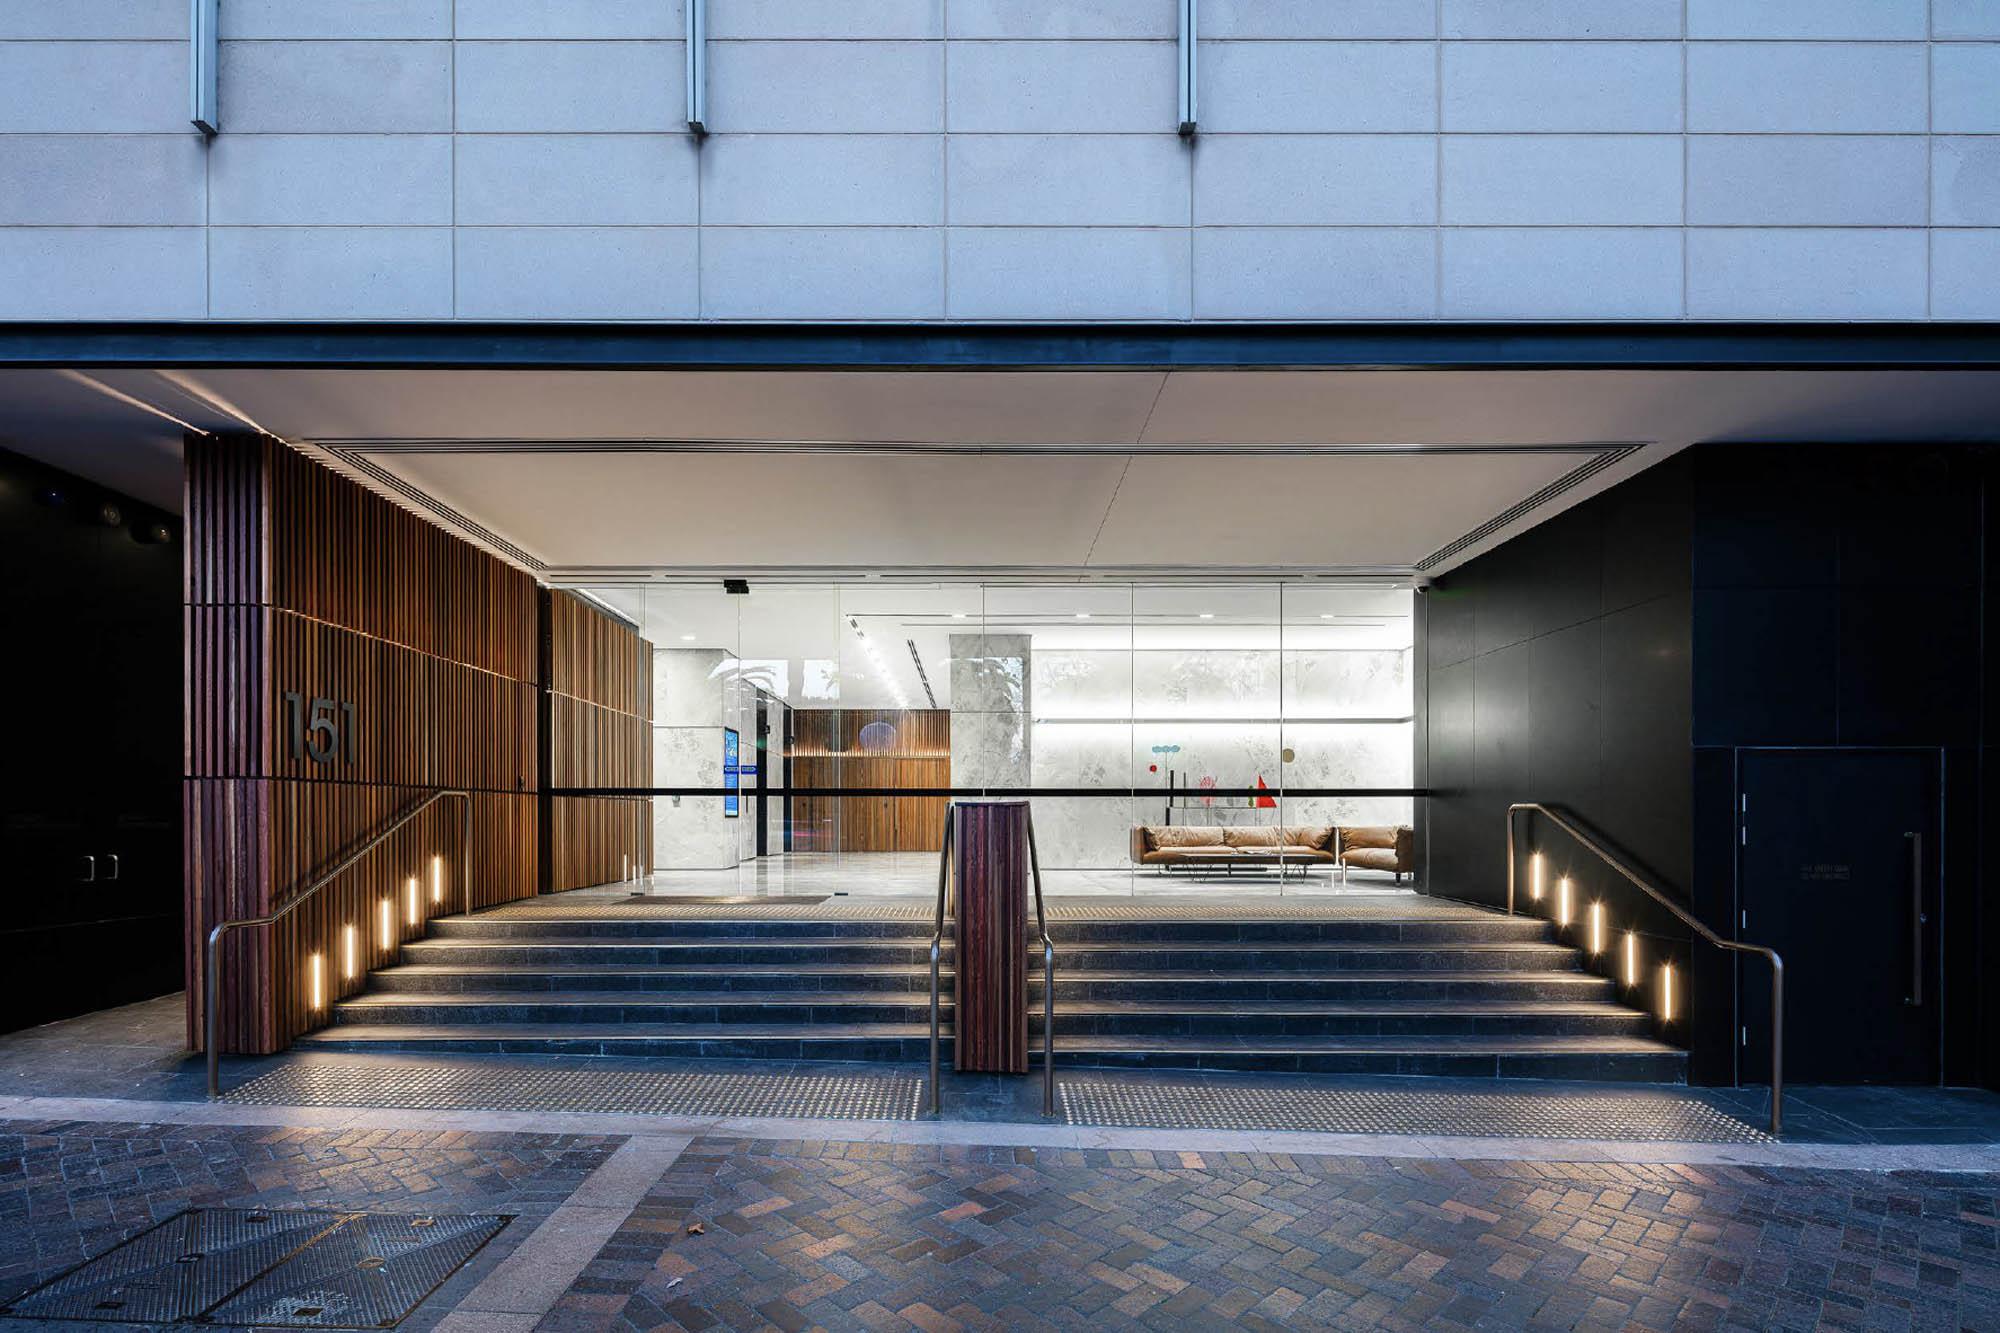 151 Macquarie Street interior construction asset refurbishment facade exterior building Sydney